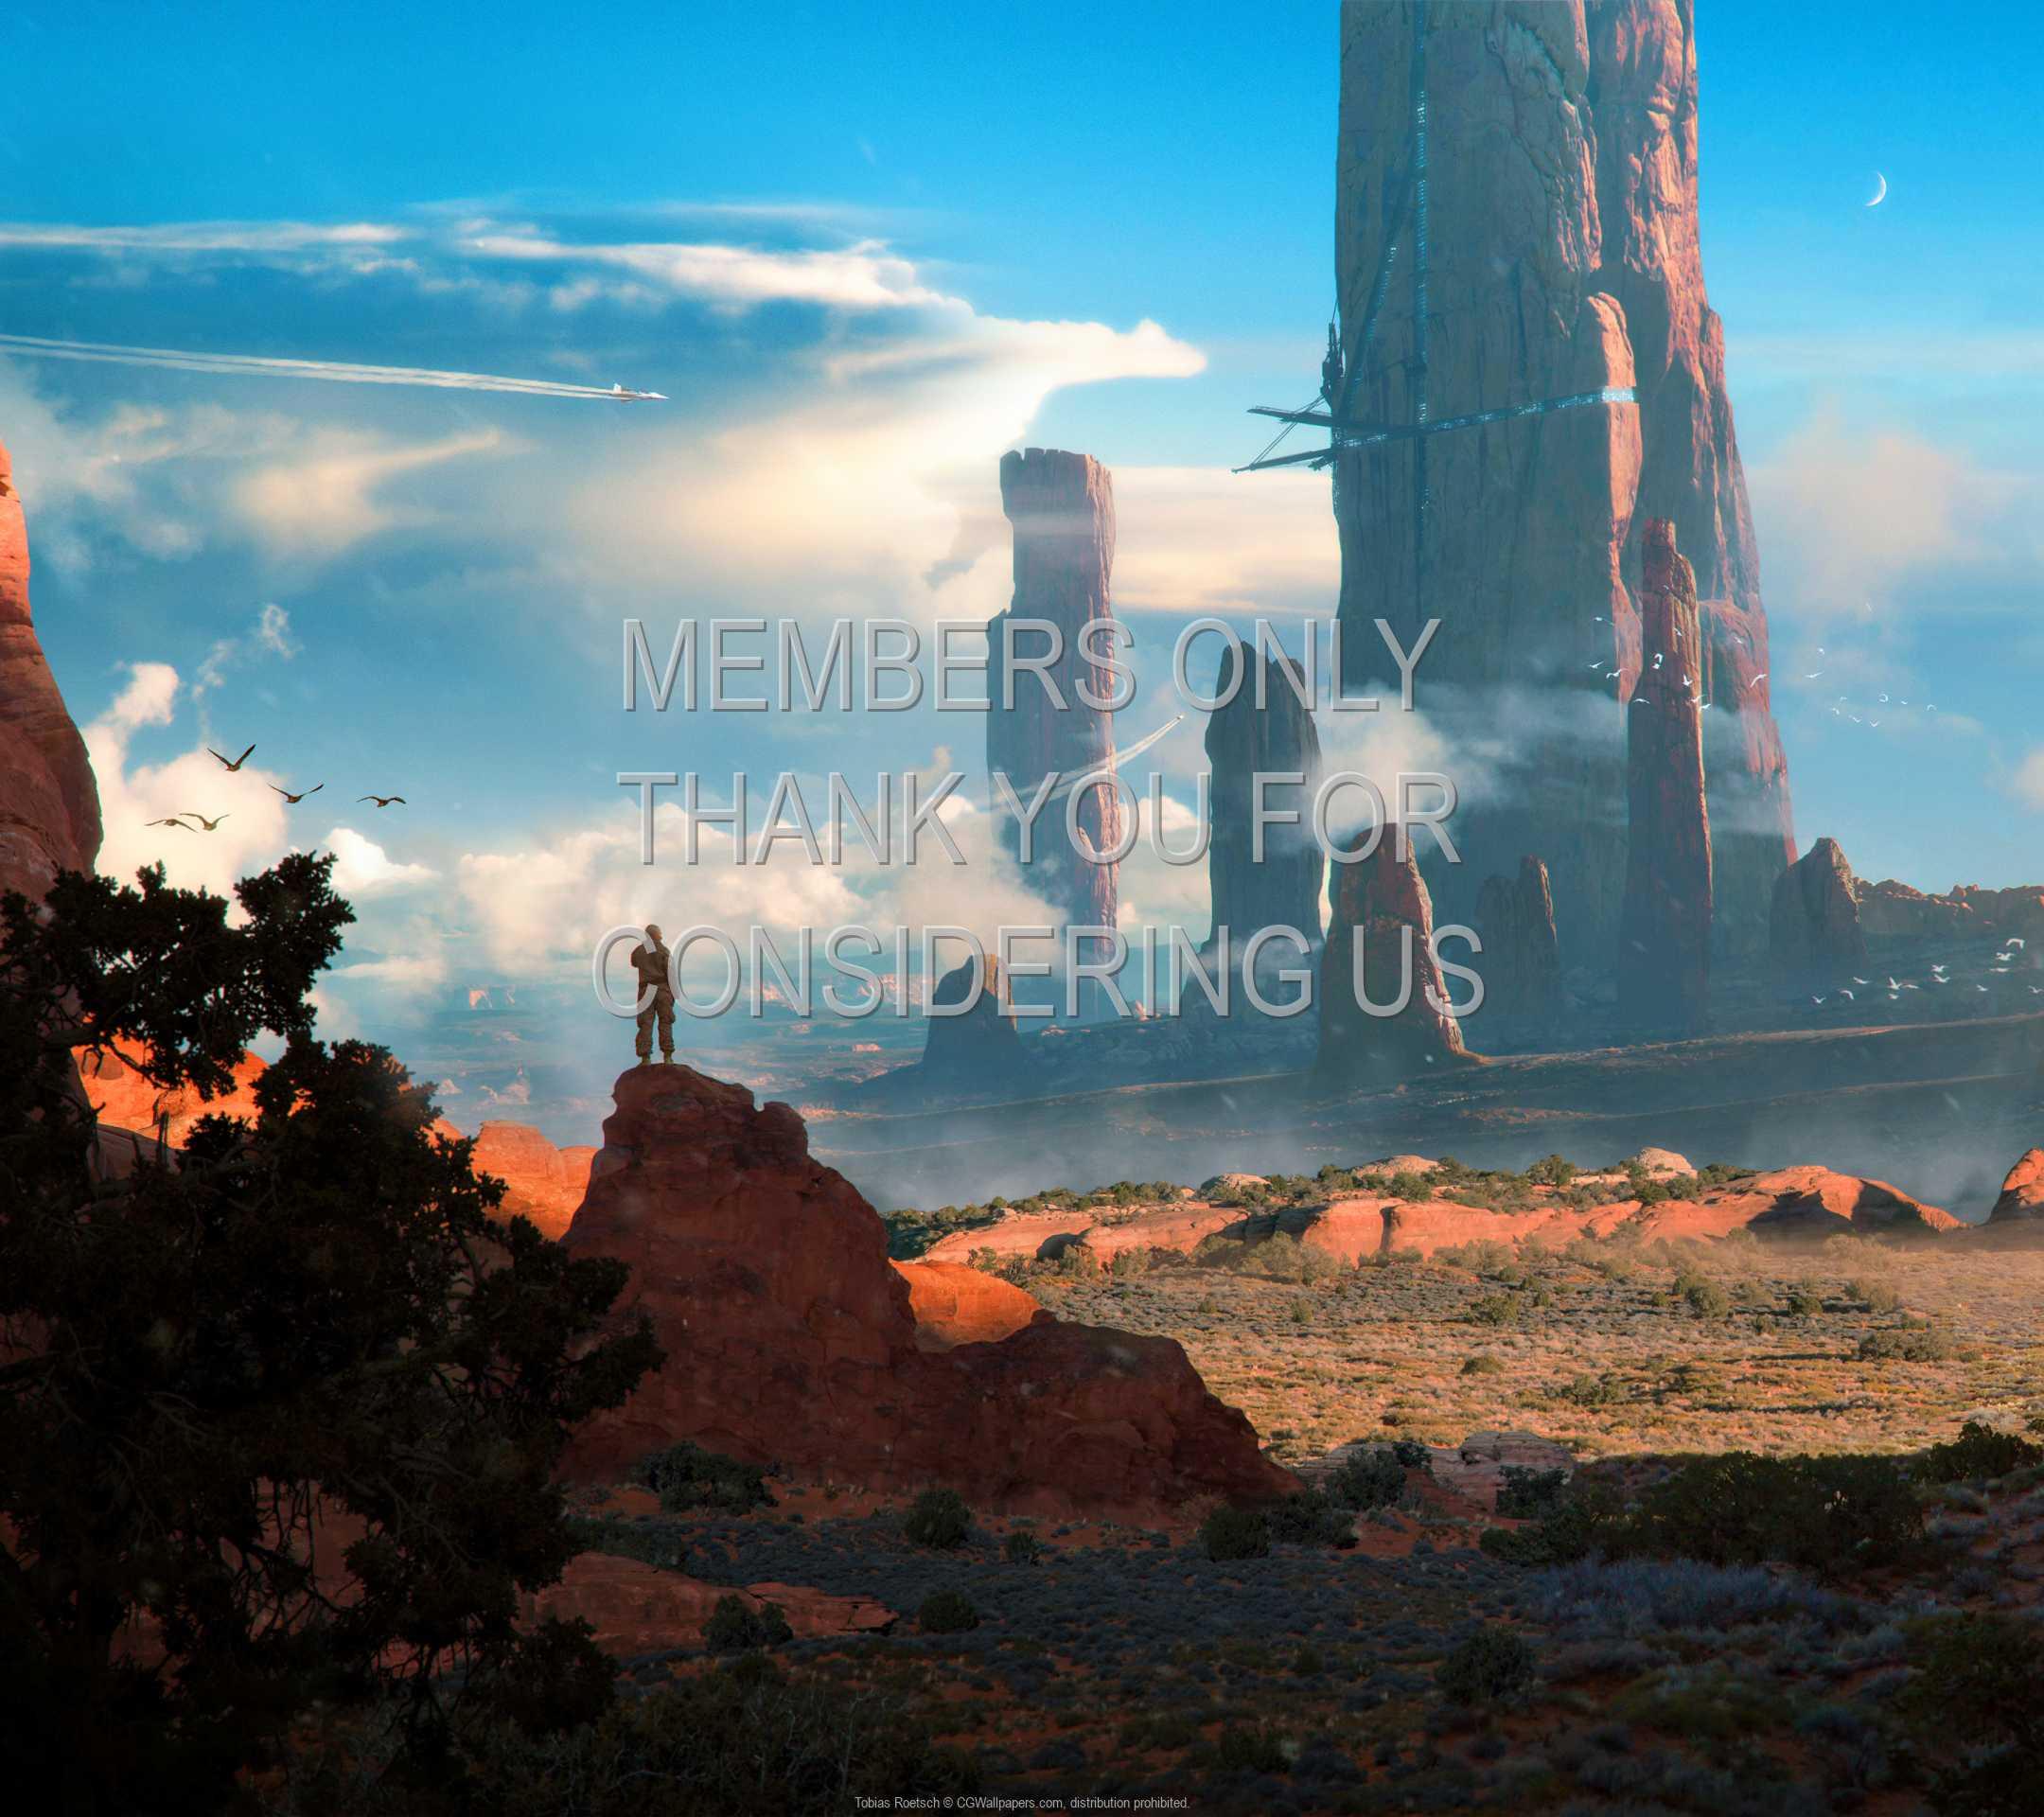 Tobias Roetsch 1080p Horizontal Mobiele achtergrond 18